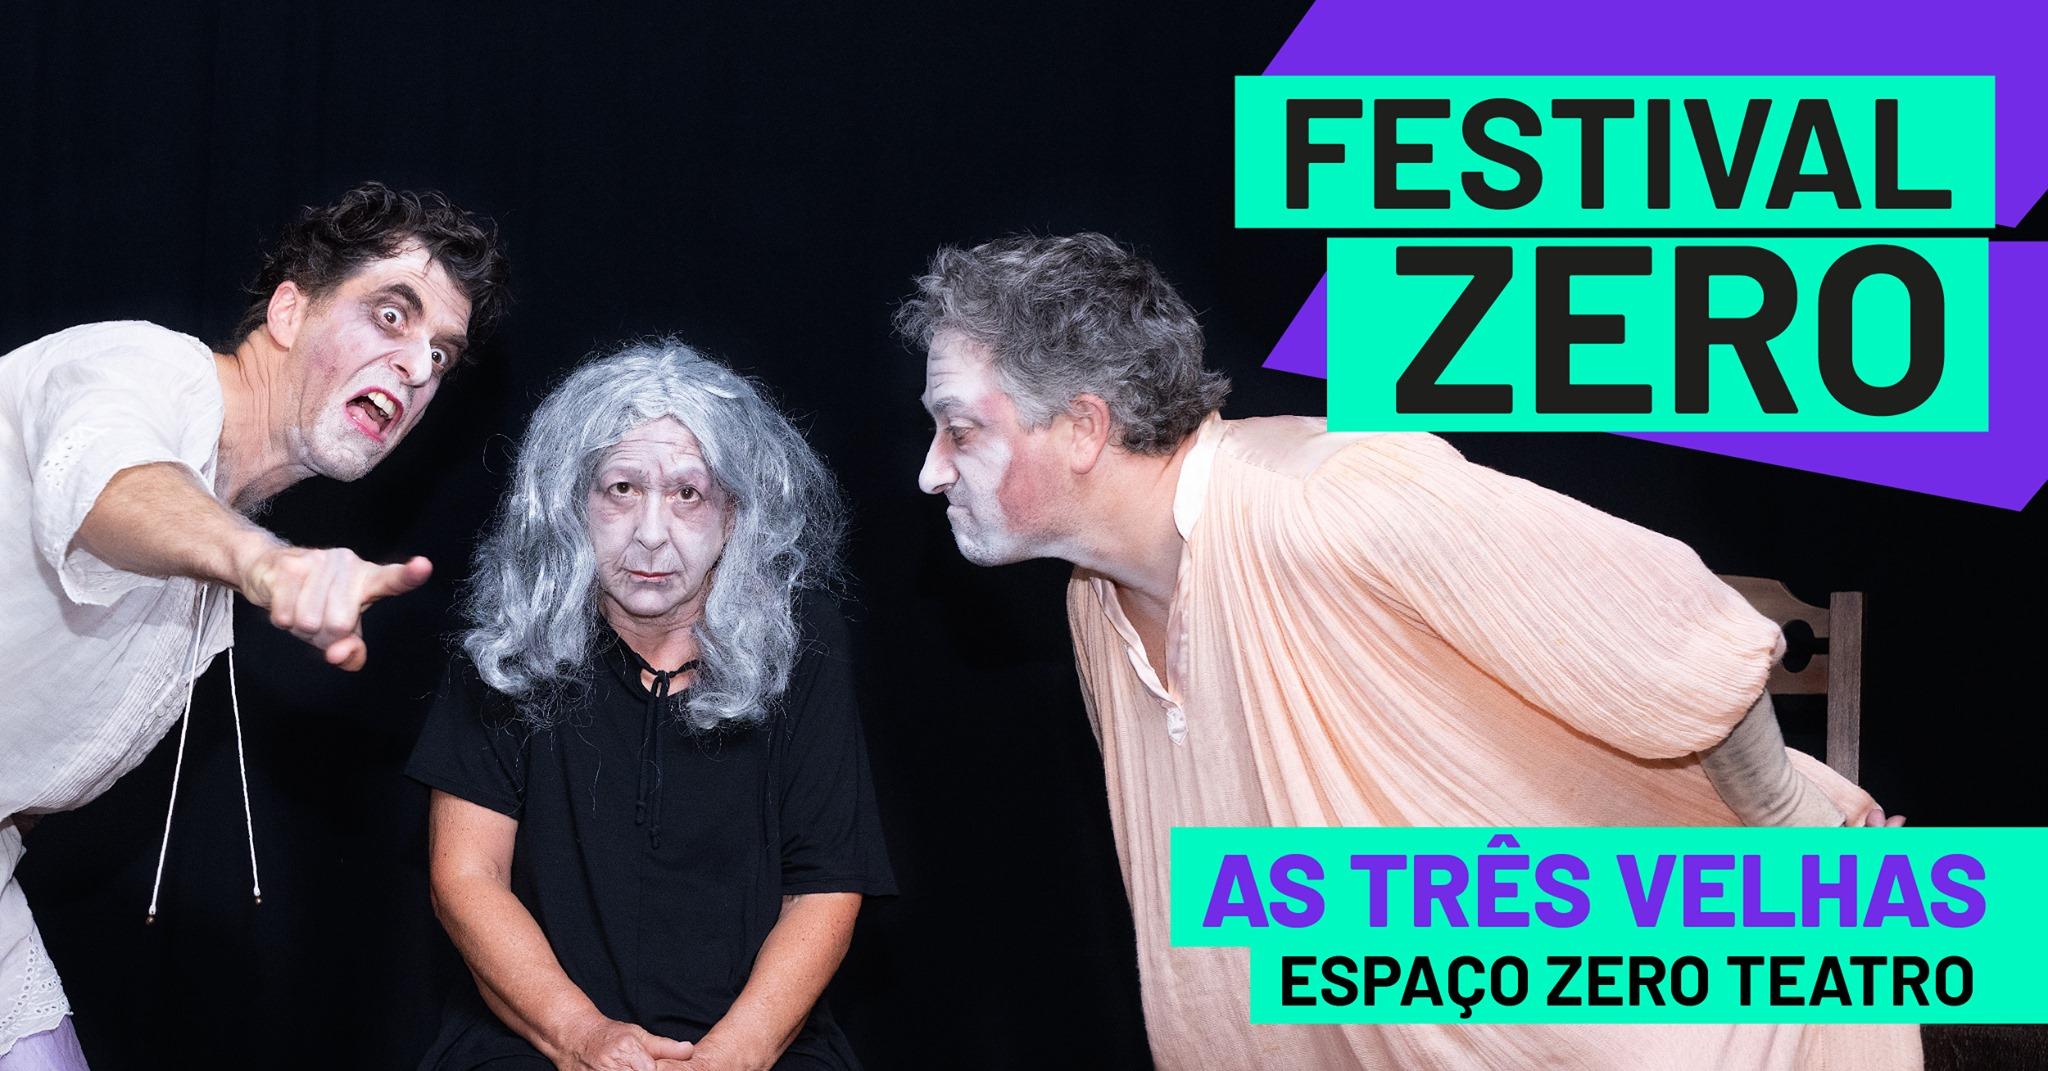 As Três Velhas, EspaçoZero Teatro